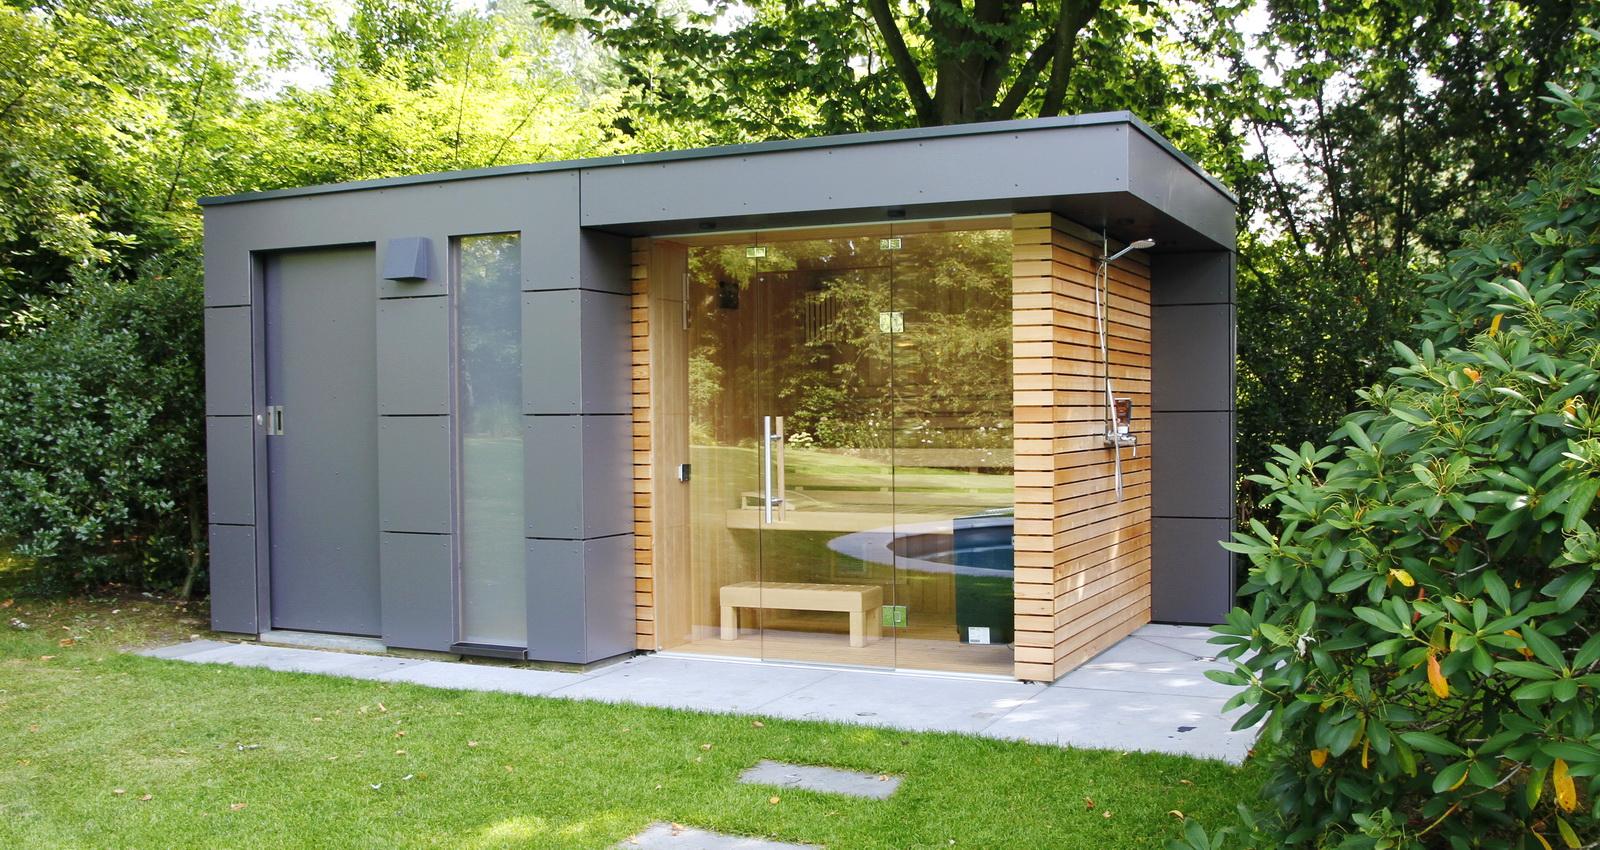 Full Size of Gartensauna Bausatz Design Gartenhaus Moderne Gartenhuser Schicke Auch Wohnzimmer Gartensauna Bausatz